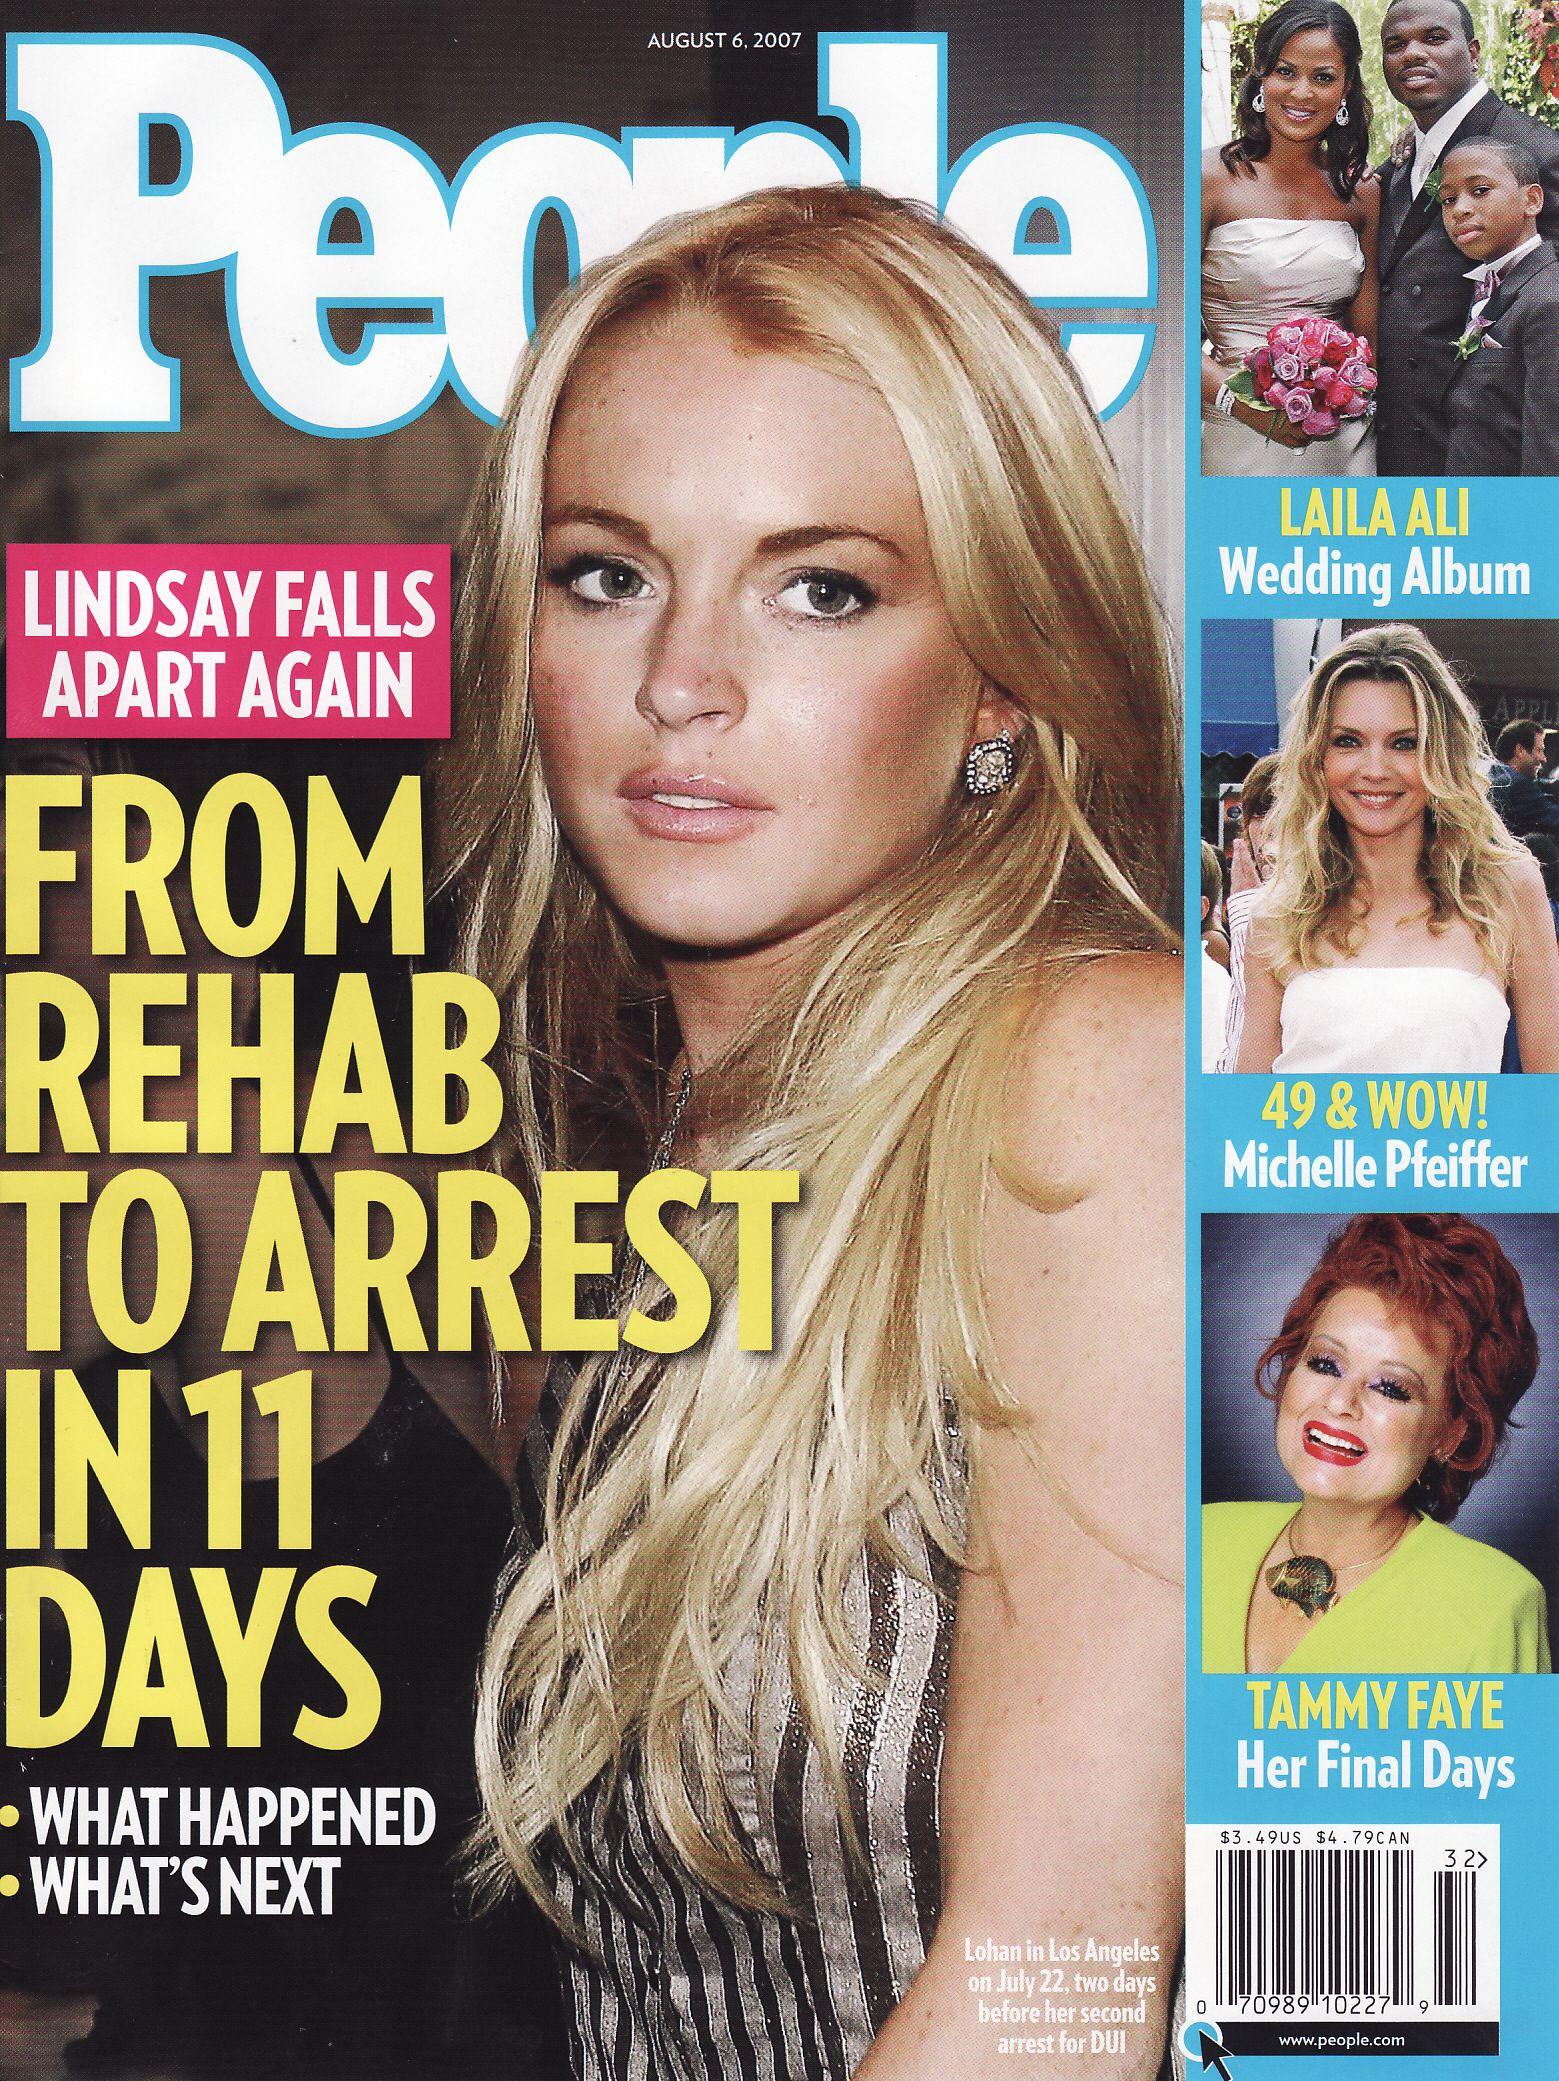 Lindsay Lohan in People Magazine, August 6 2007   People magazine covers,  People magazine, Lindsay